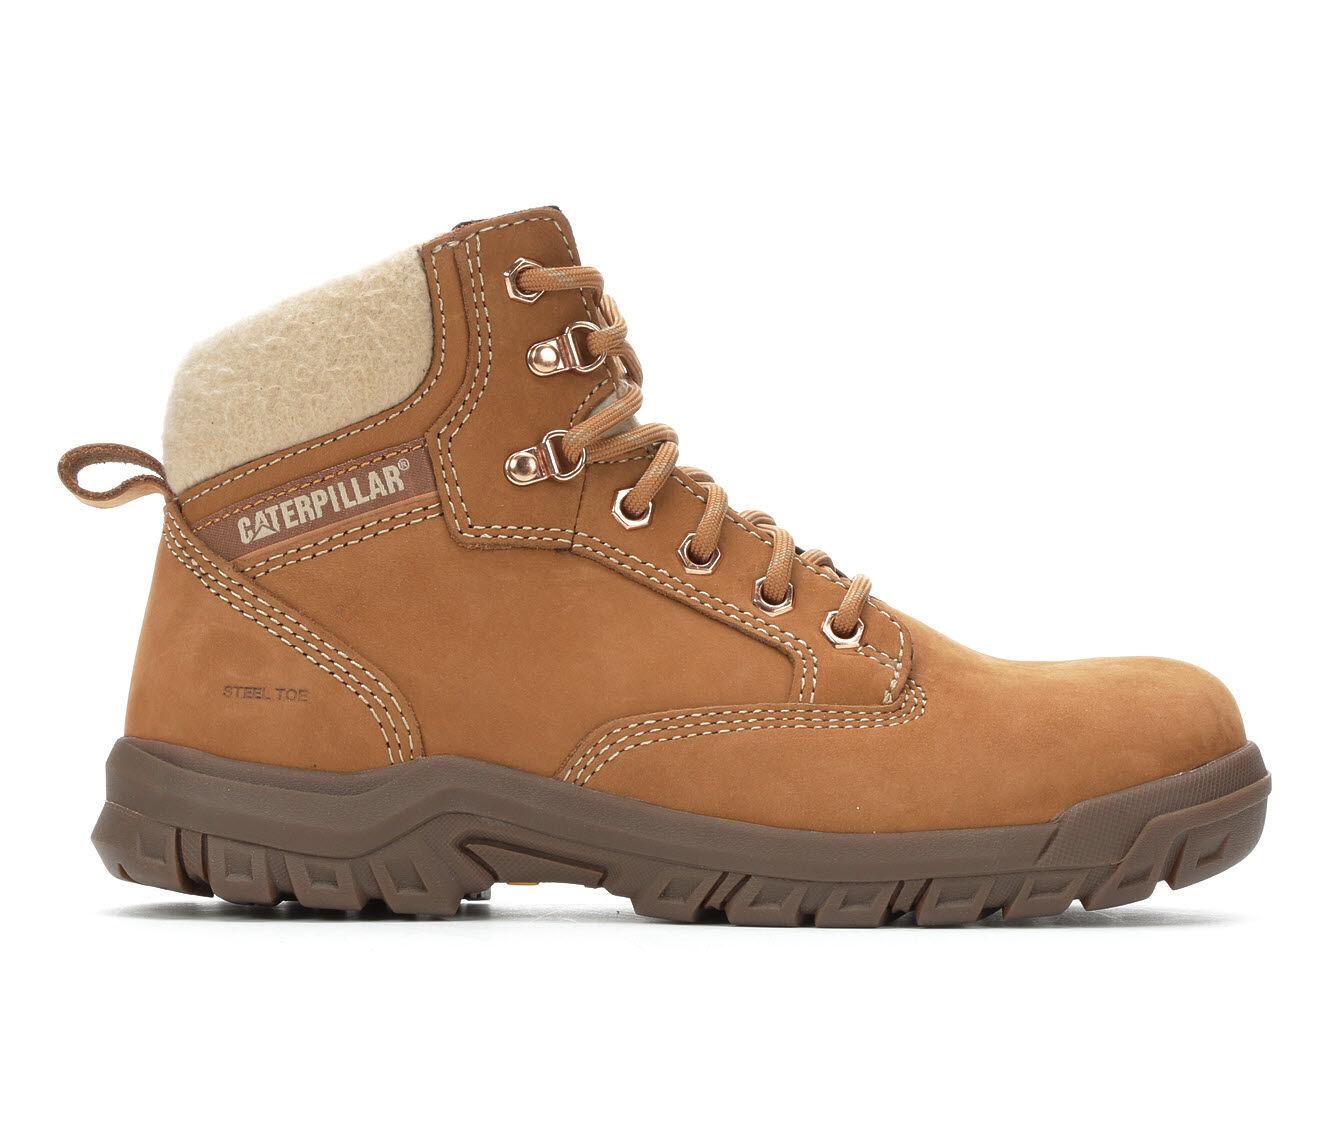 Women's Caterpillar Tess 6in Steel Toe Work Shoes Sundance